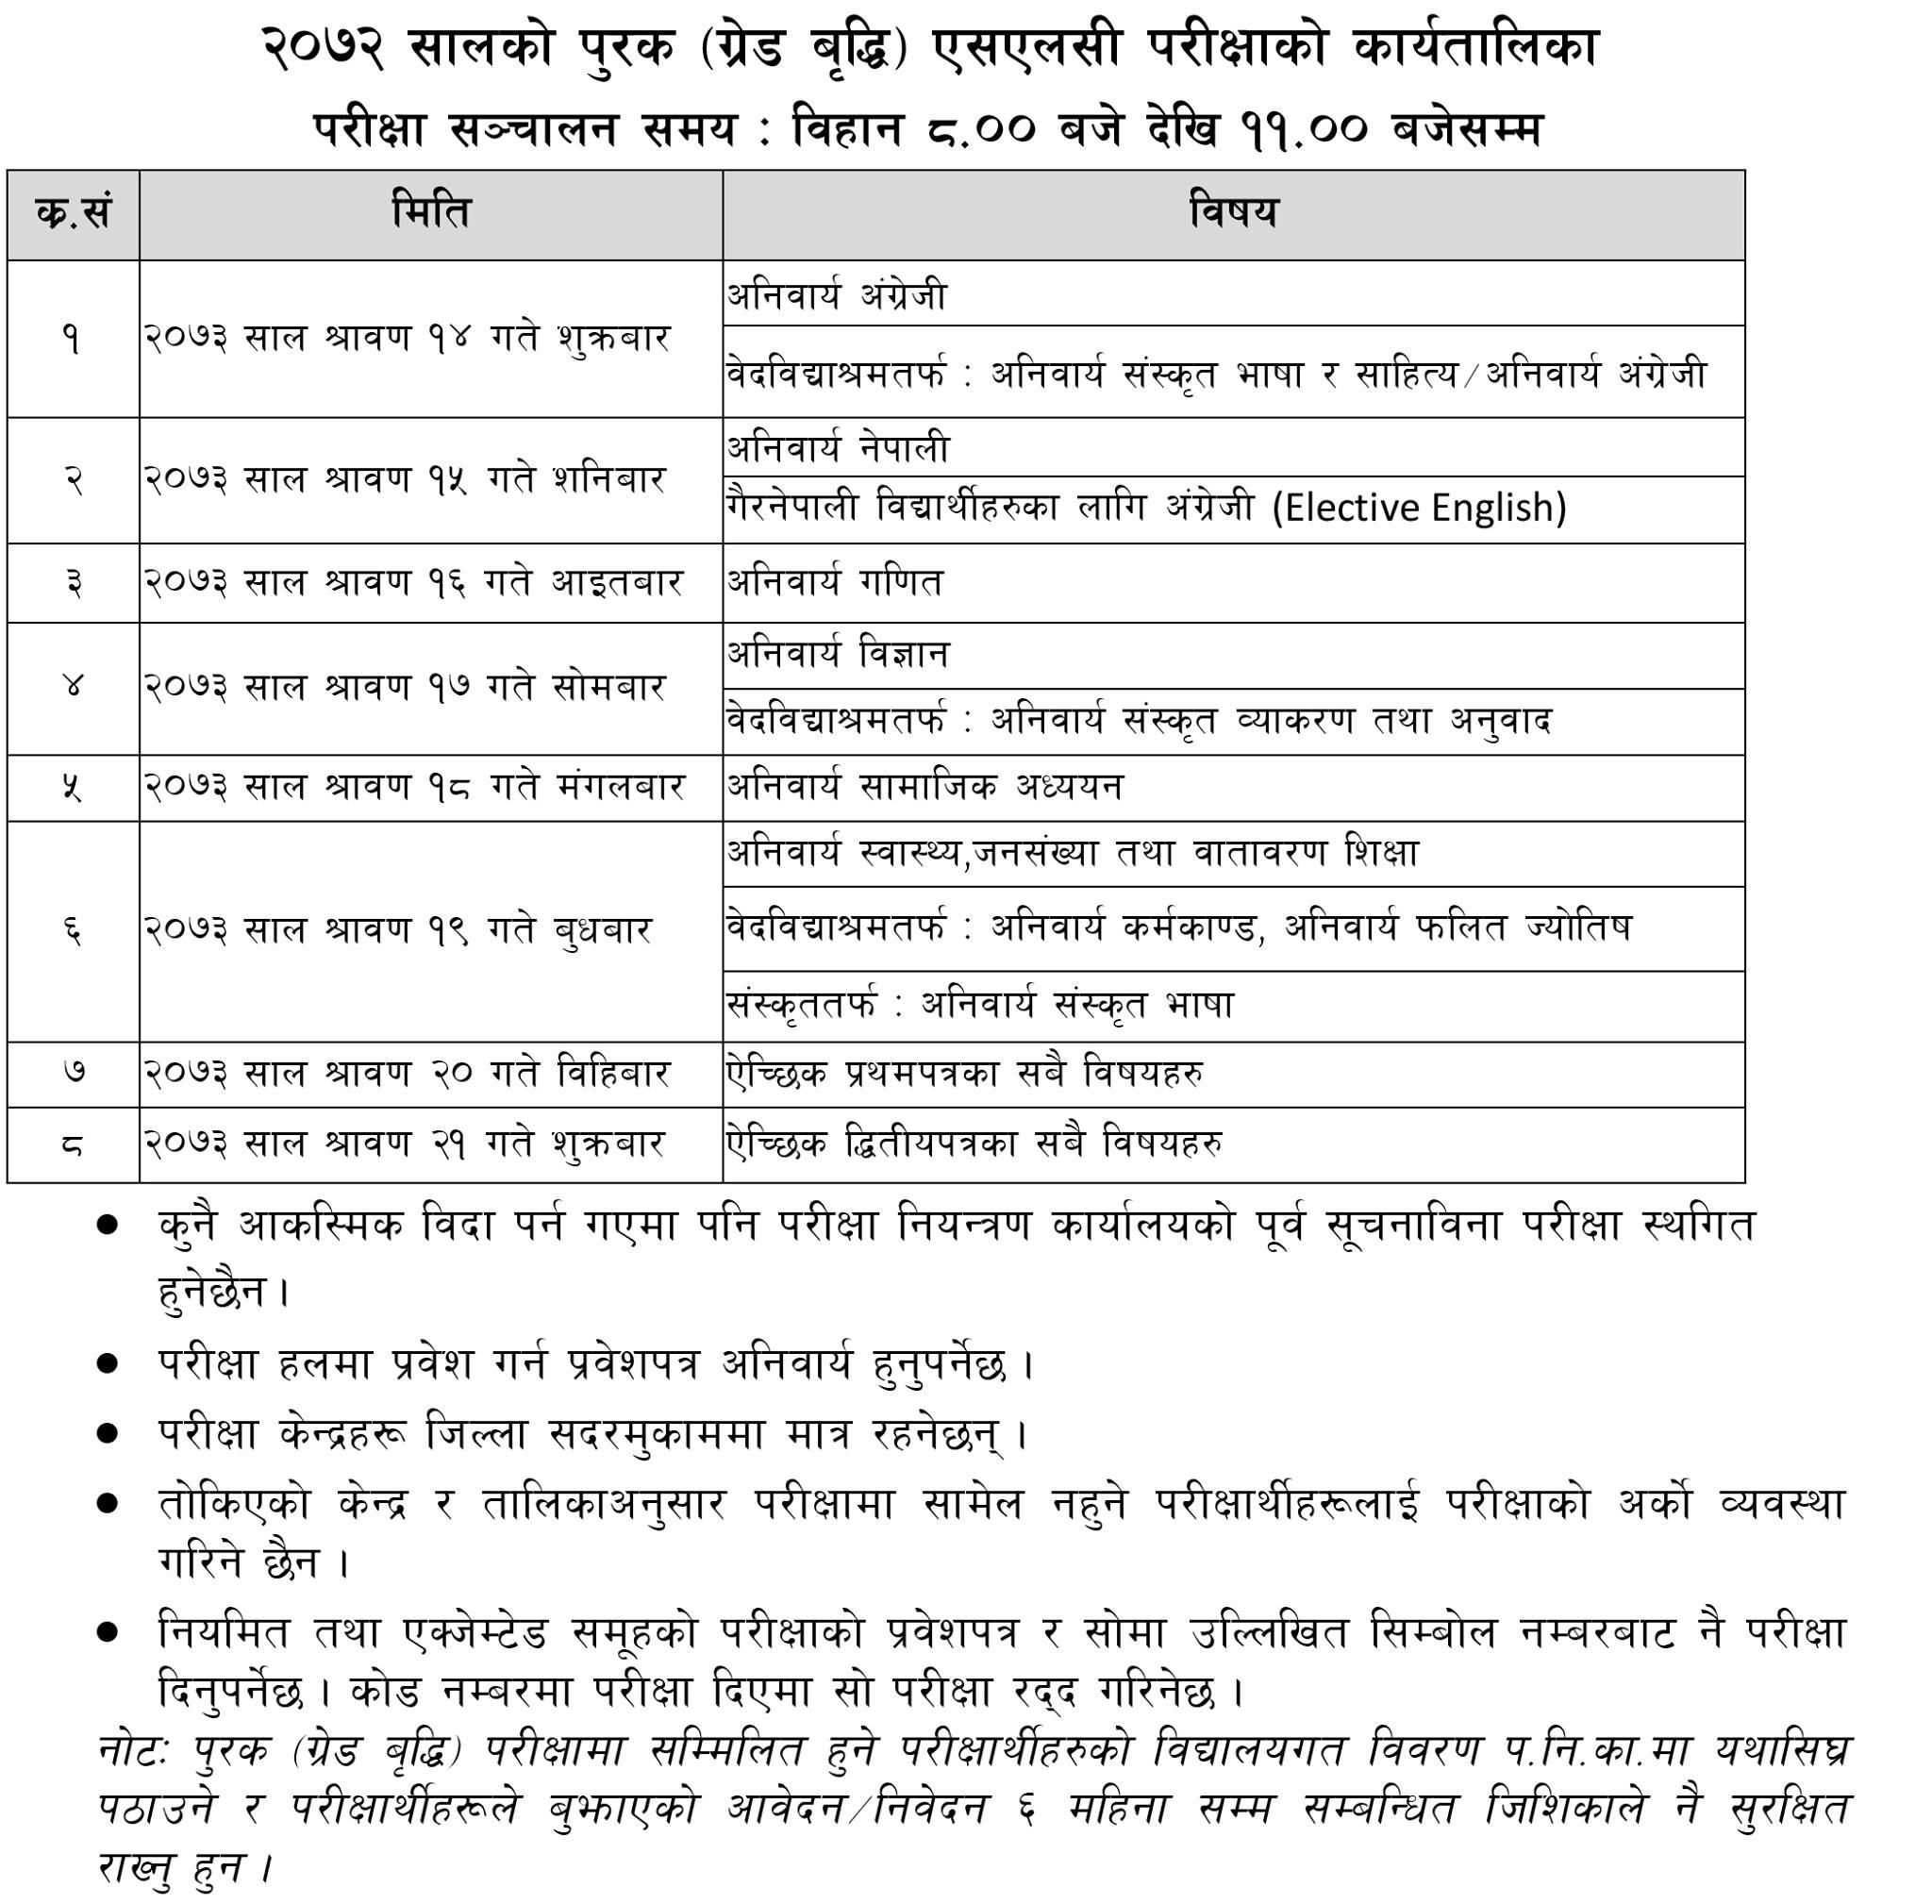 slc-supplementary-exam-routine-2073